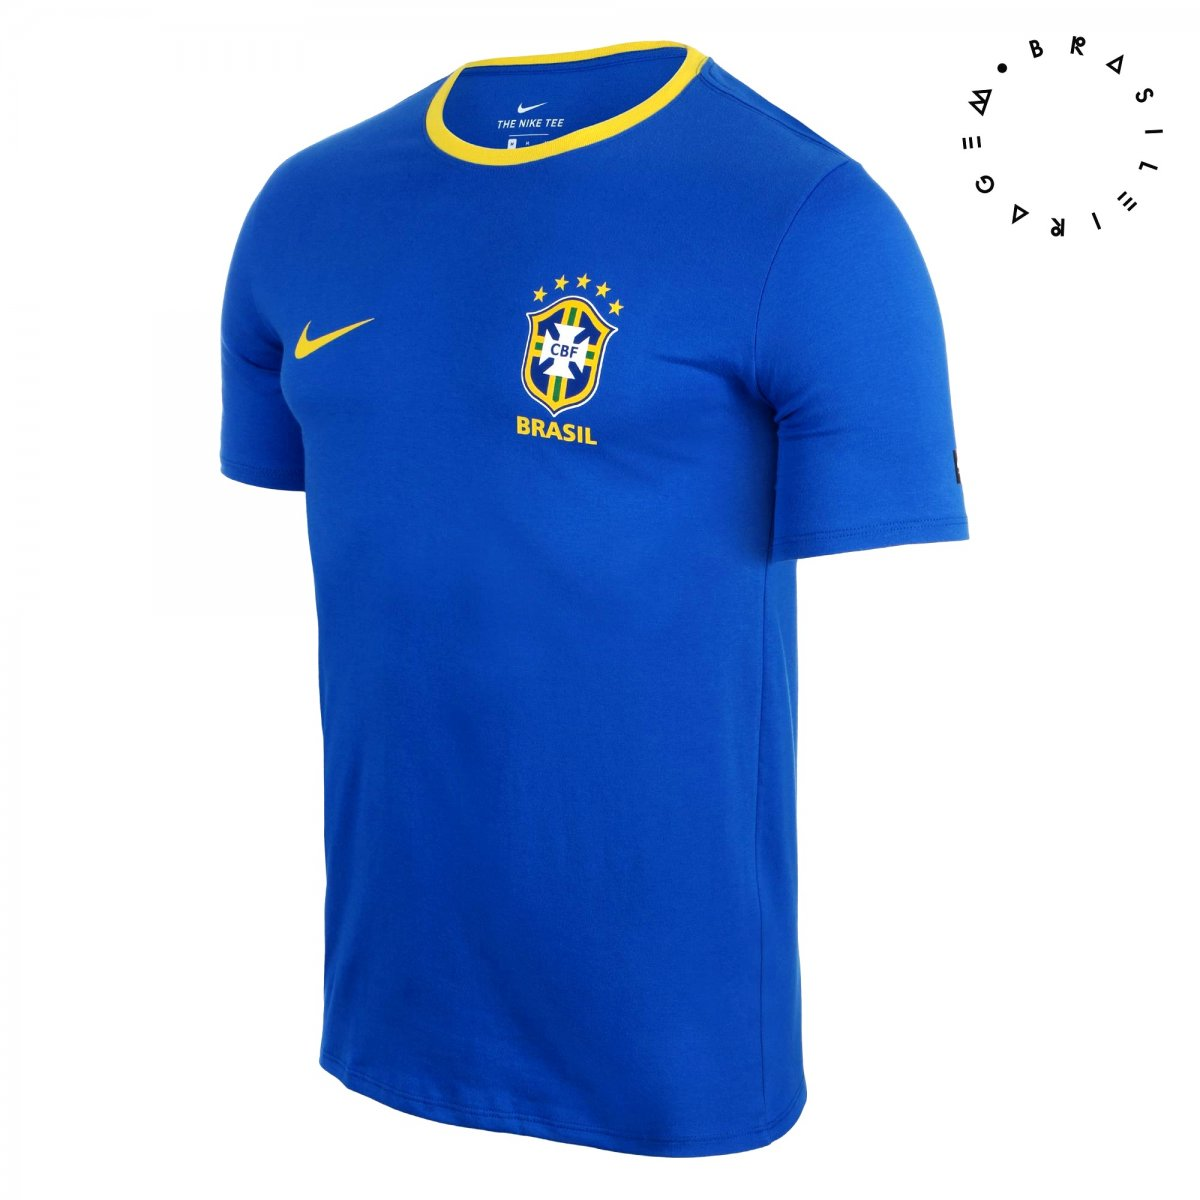 f28992497b Camisa Masculina Nike Brasil CBF Crest 2018 888320-403 - Azul ...